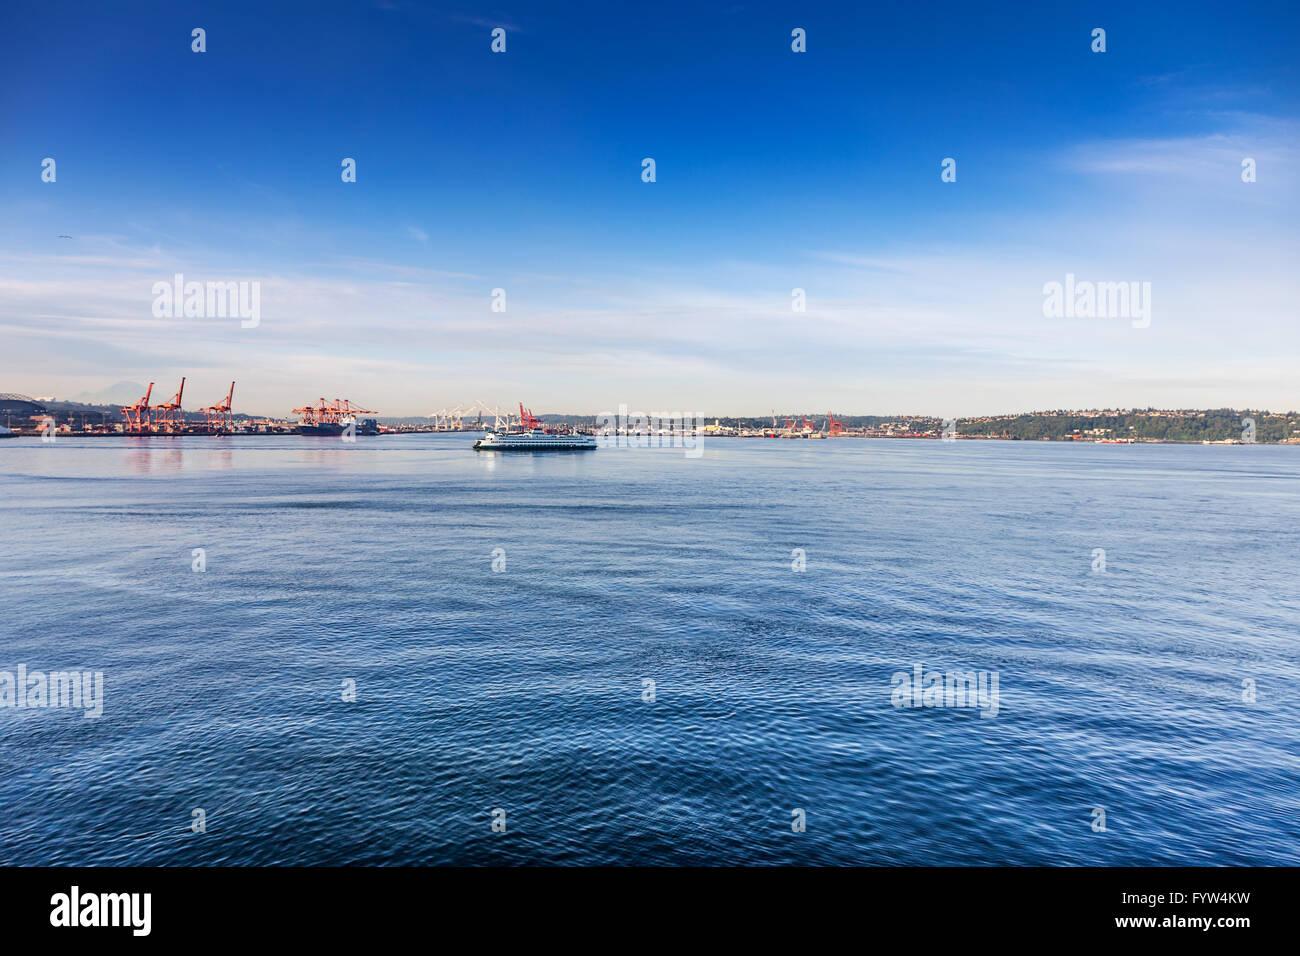 Washington State Ferry in Elliot Bay - Stock Image